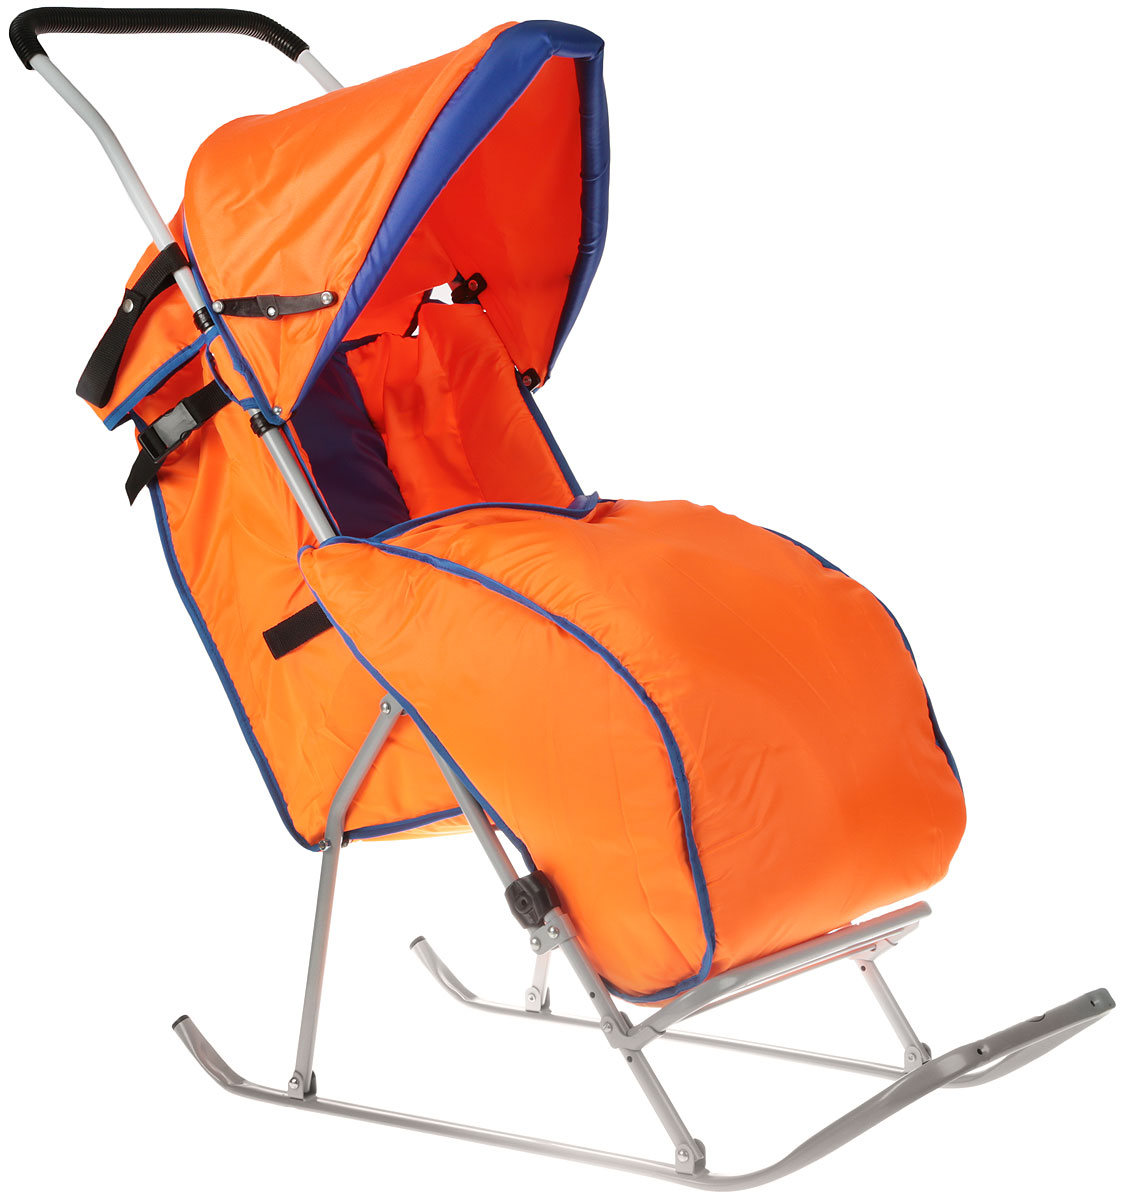 Фея Санки-коляска Метелица Люкс с тентом цвет синий оранжевый